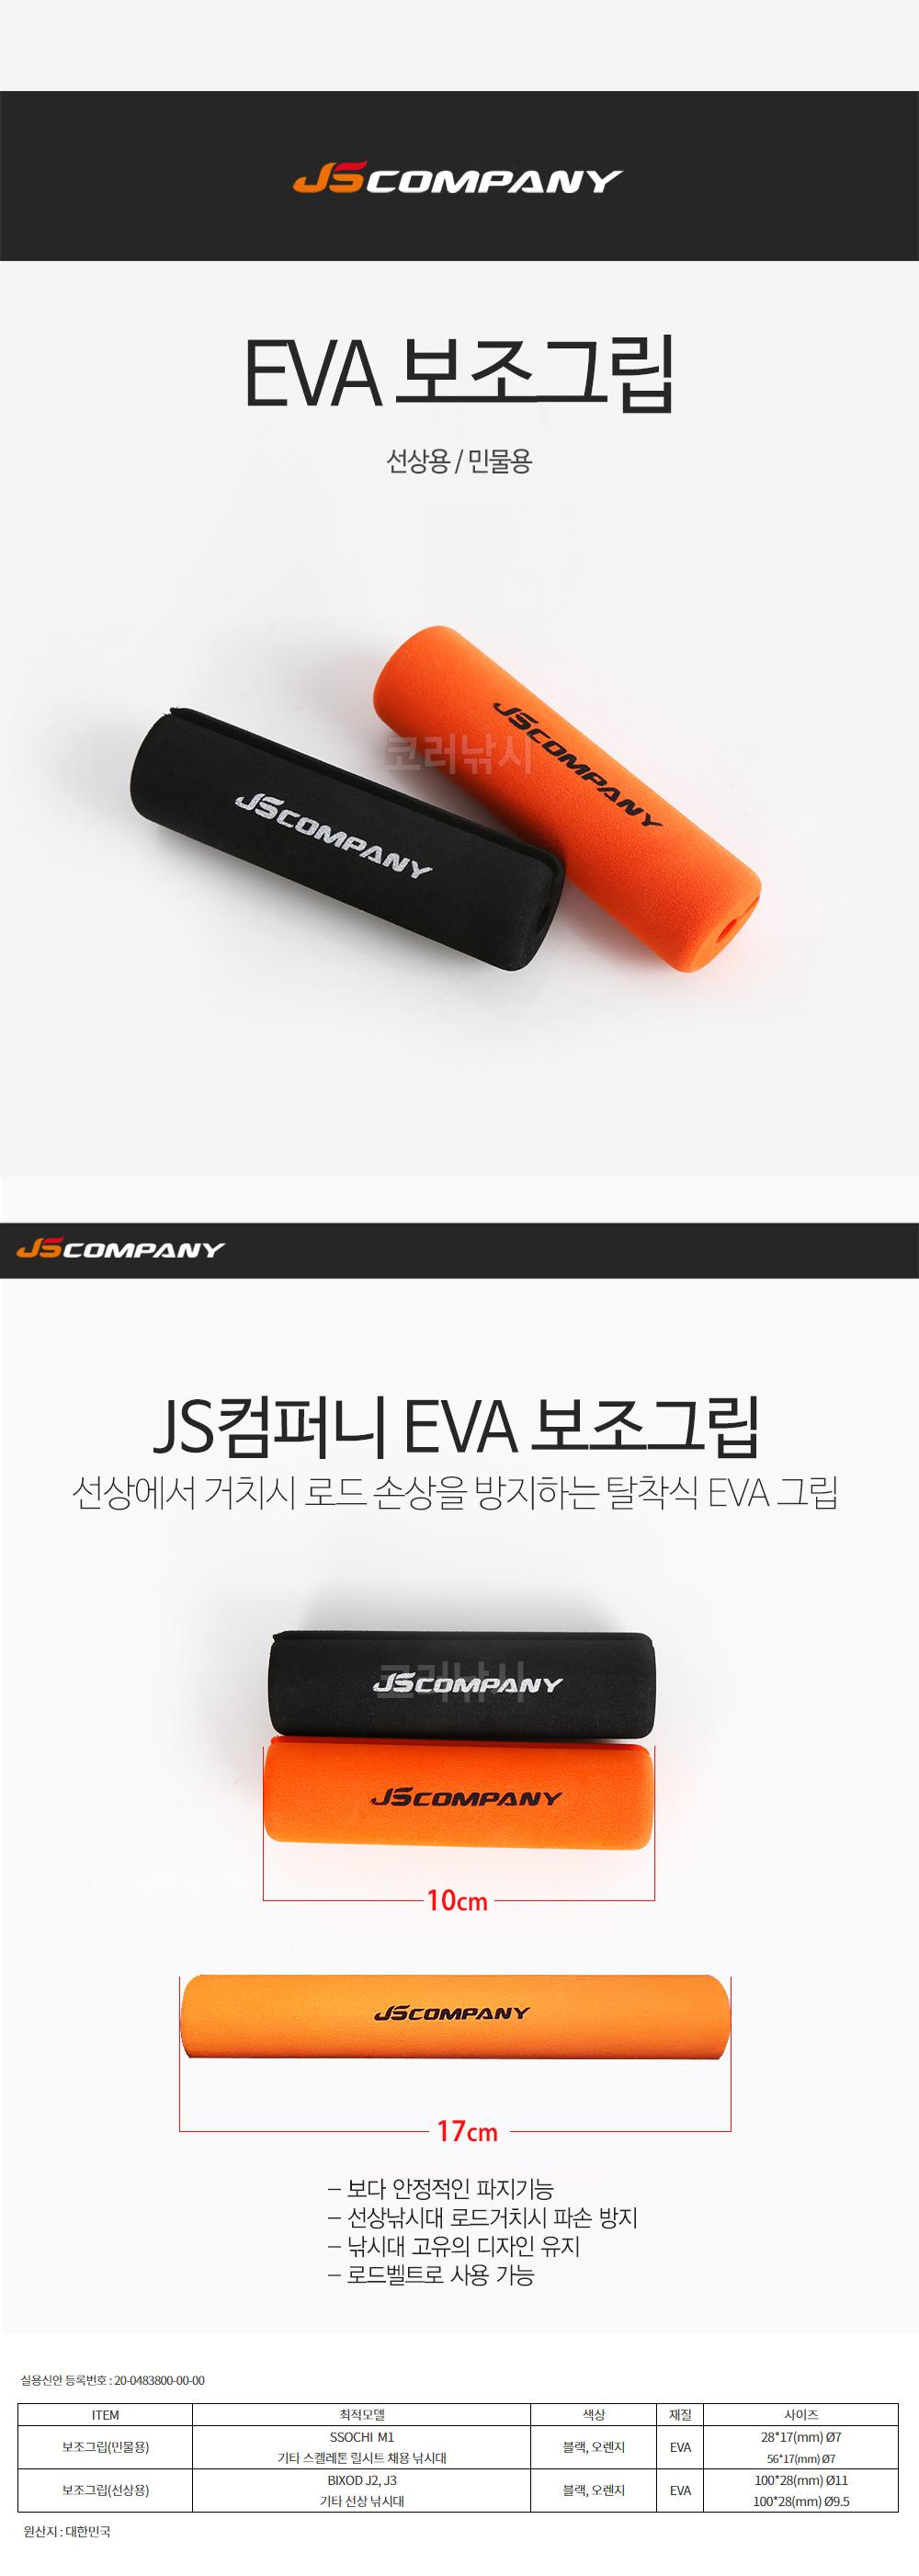 JS컴퍼니 EVA 보조그립 낚시대보조그립 로드포지션